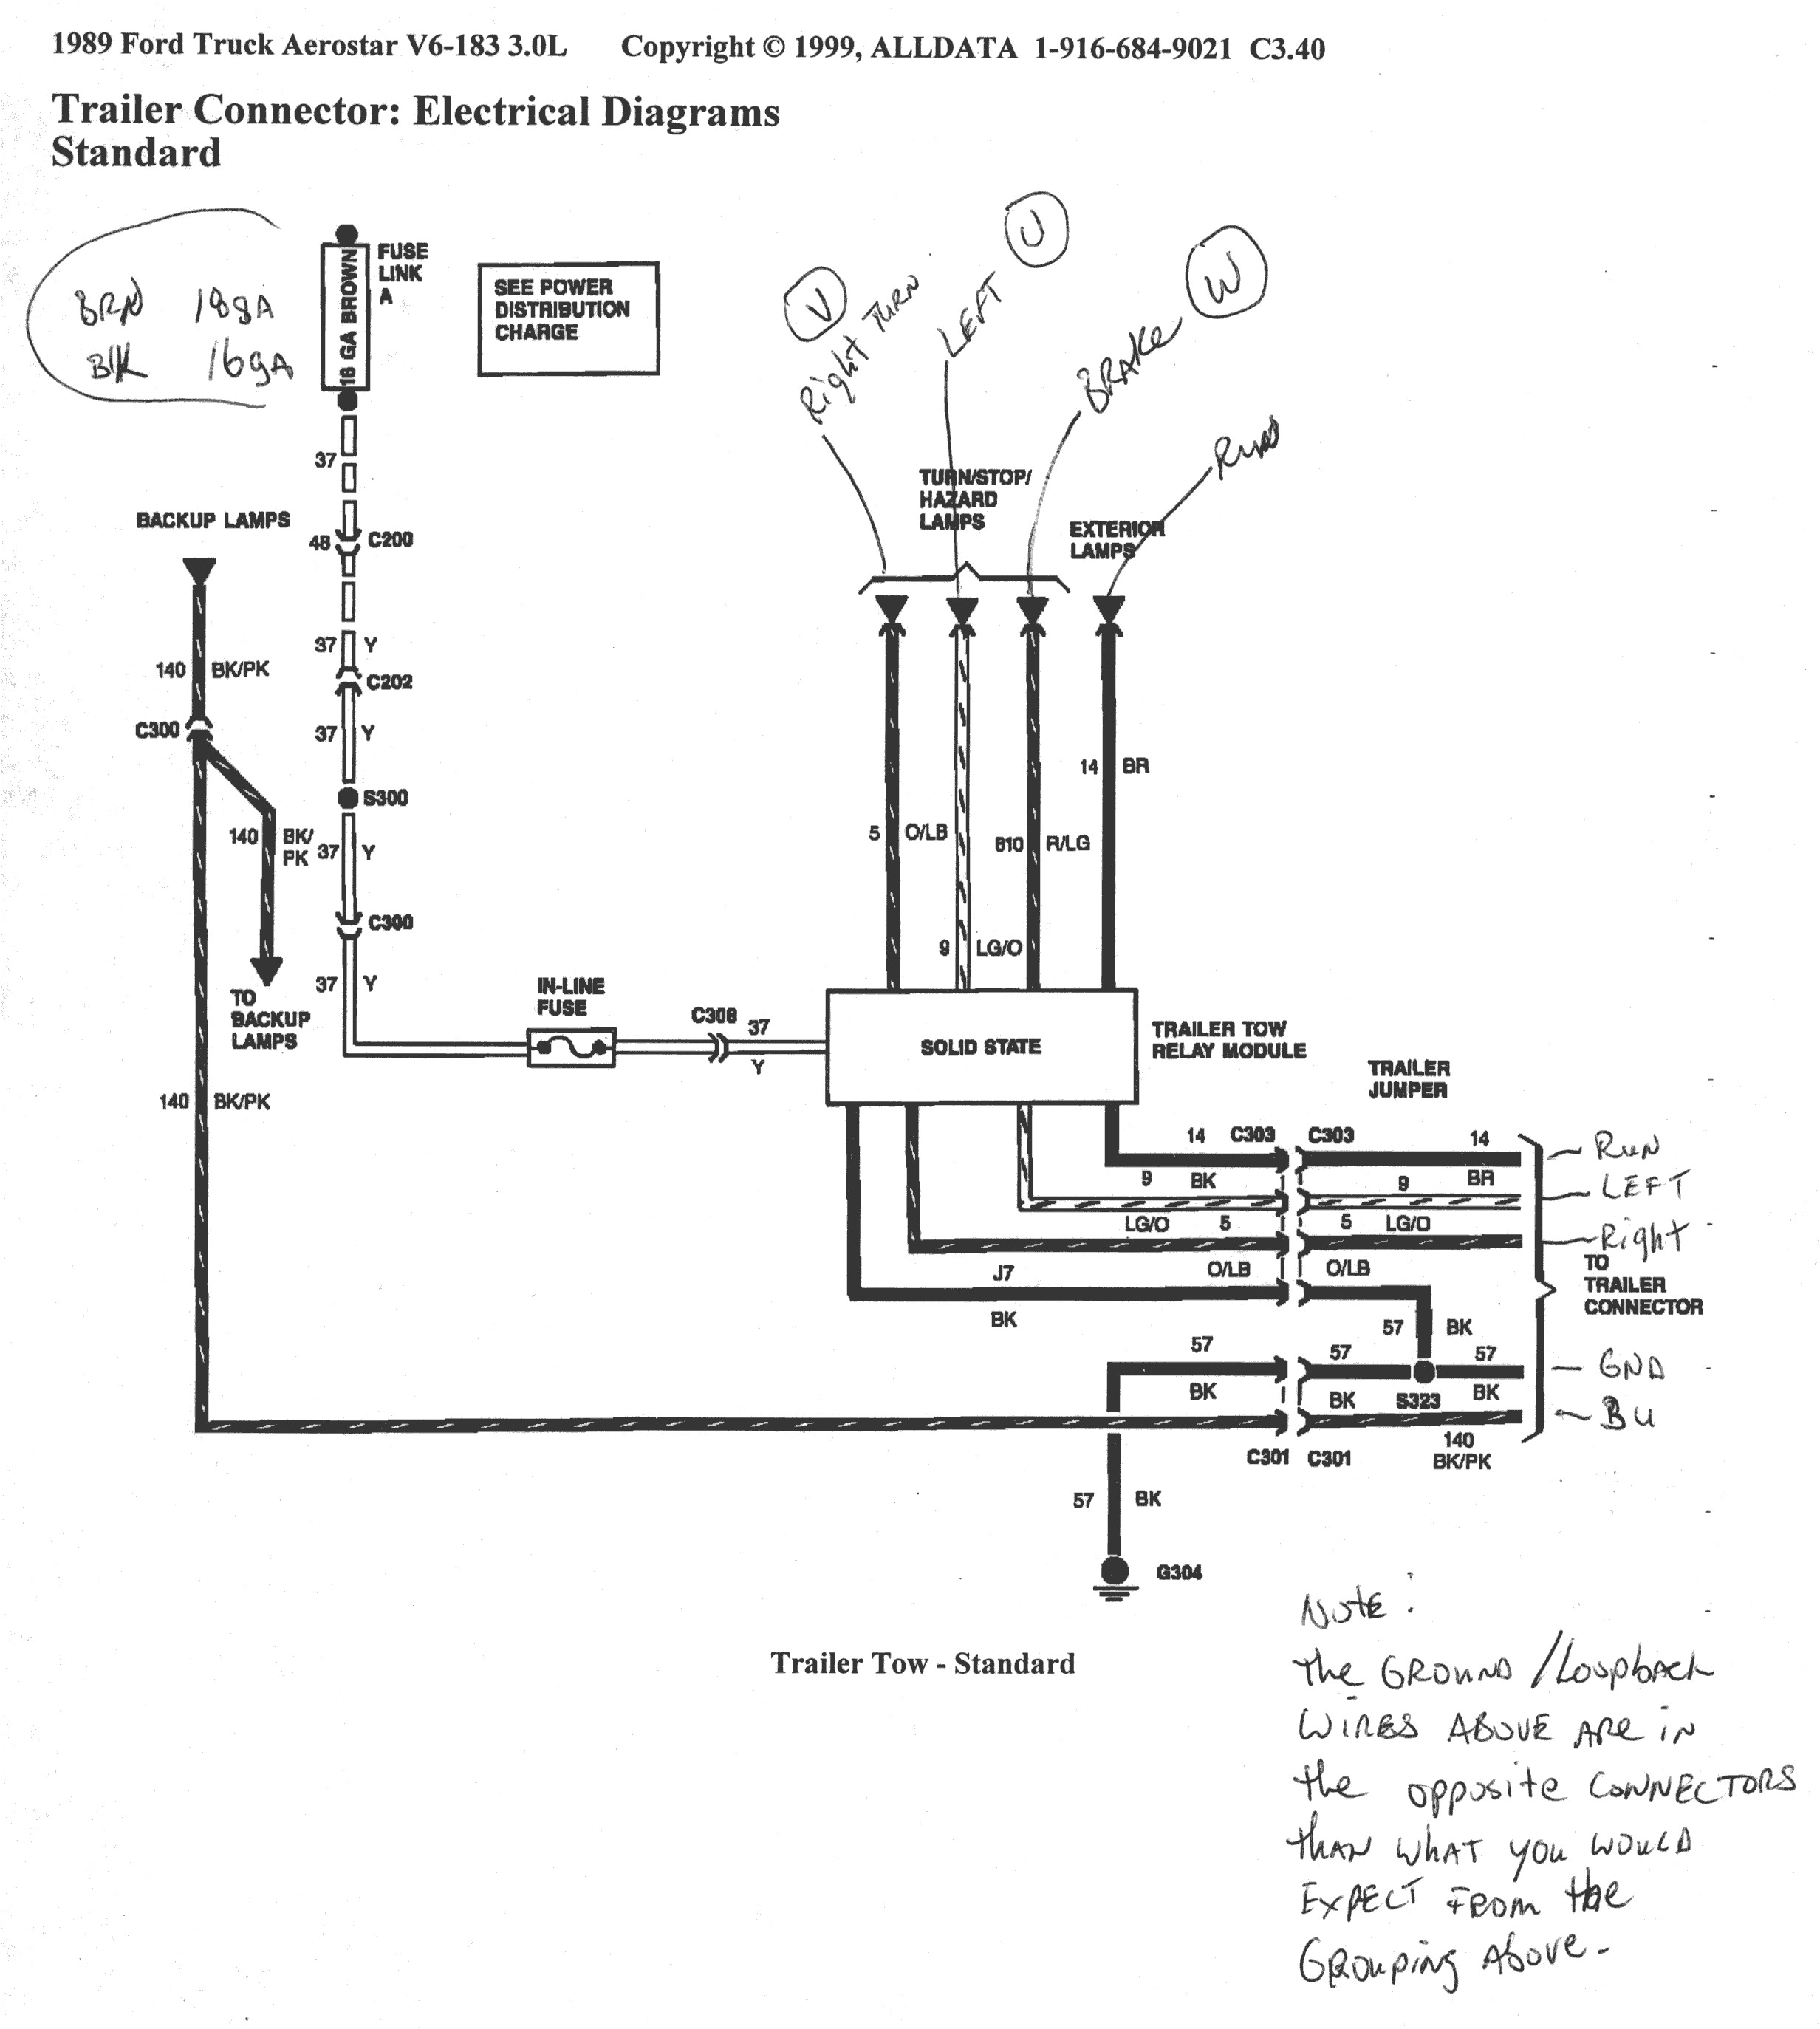 2015 ford f 150 trailer wiring diagram unique troubleshooting ford f250 trailer wiring harness diagram wiring of 2015 ford f 150 trailer wiring diagram jpg